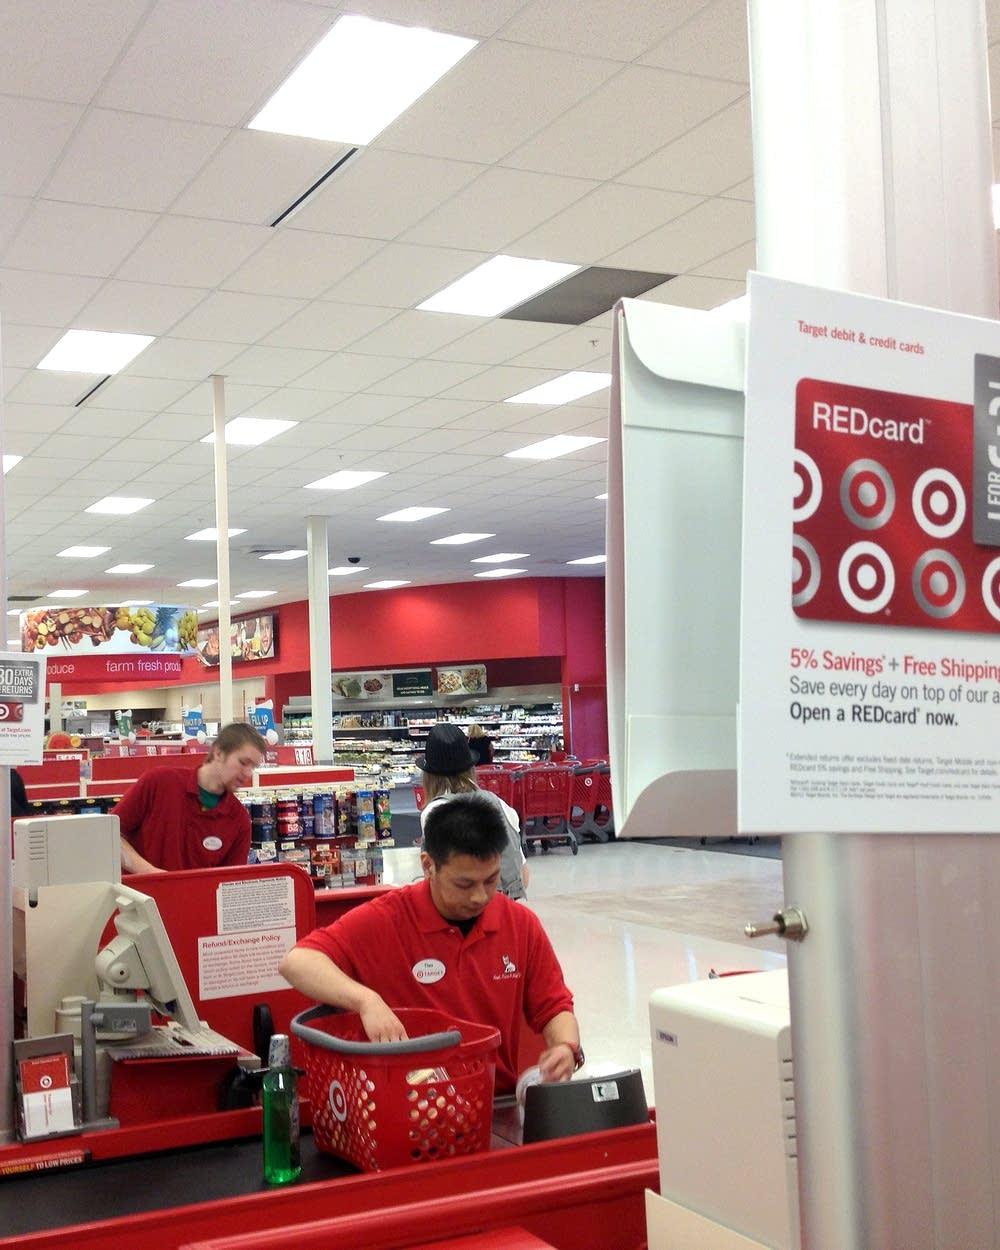 Target S Redcard Revs Up Sales Mpr News